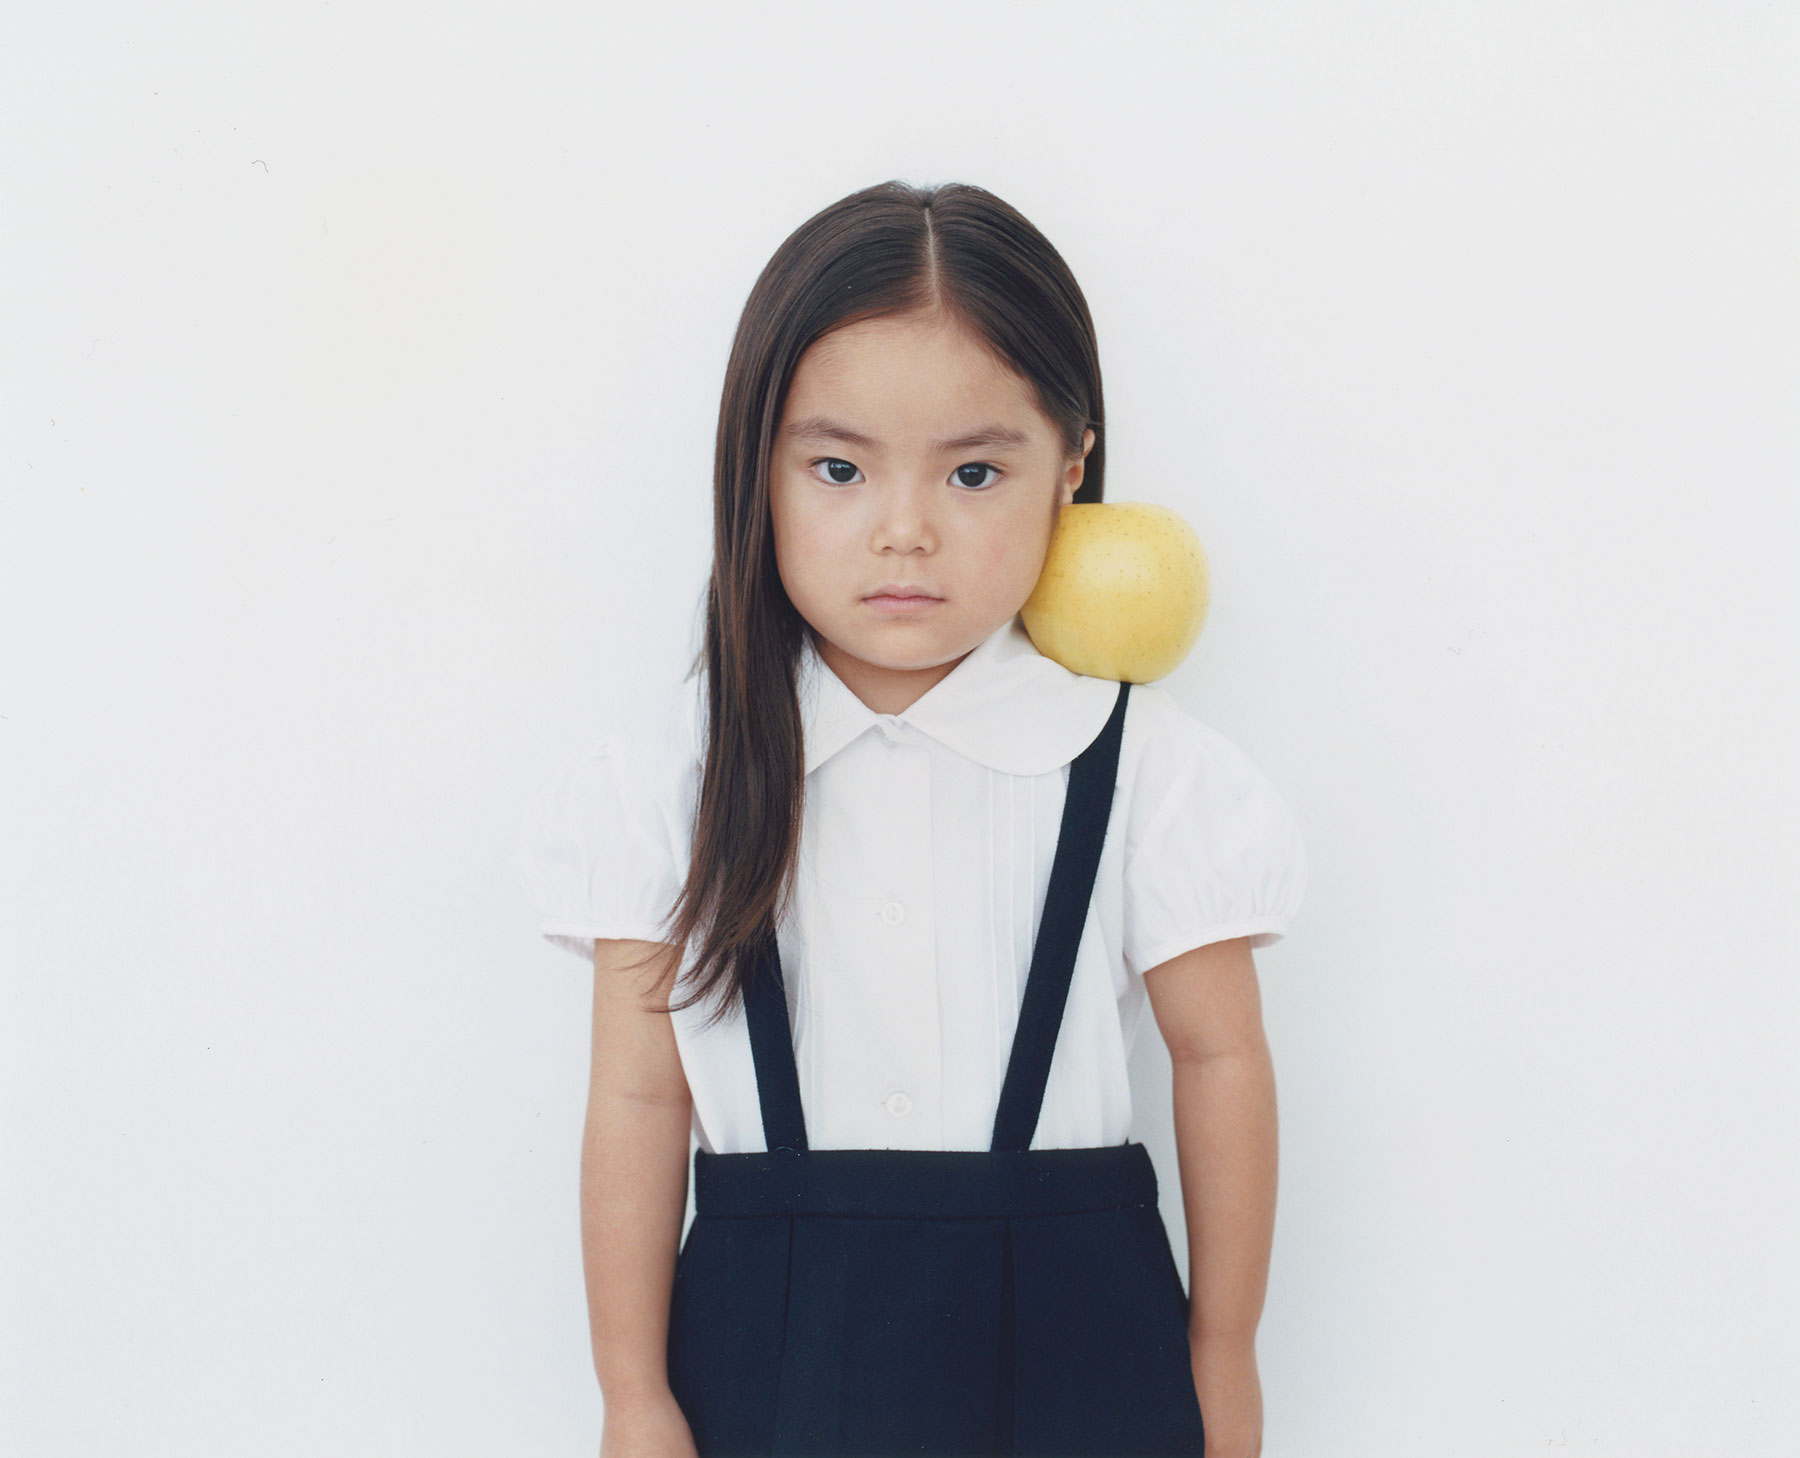 Osamu Yokonami,  1000 Children: Yellow Apple No. 71 , 2010-2013  Digital pigment print, 895 x 1105 mm (approx. 35 x 43.5 in), edition of 5; 146 x 168 mm (approx. 5.75 x 6.6 in), edition of 10   Inquire